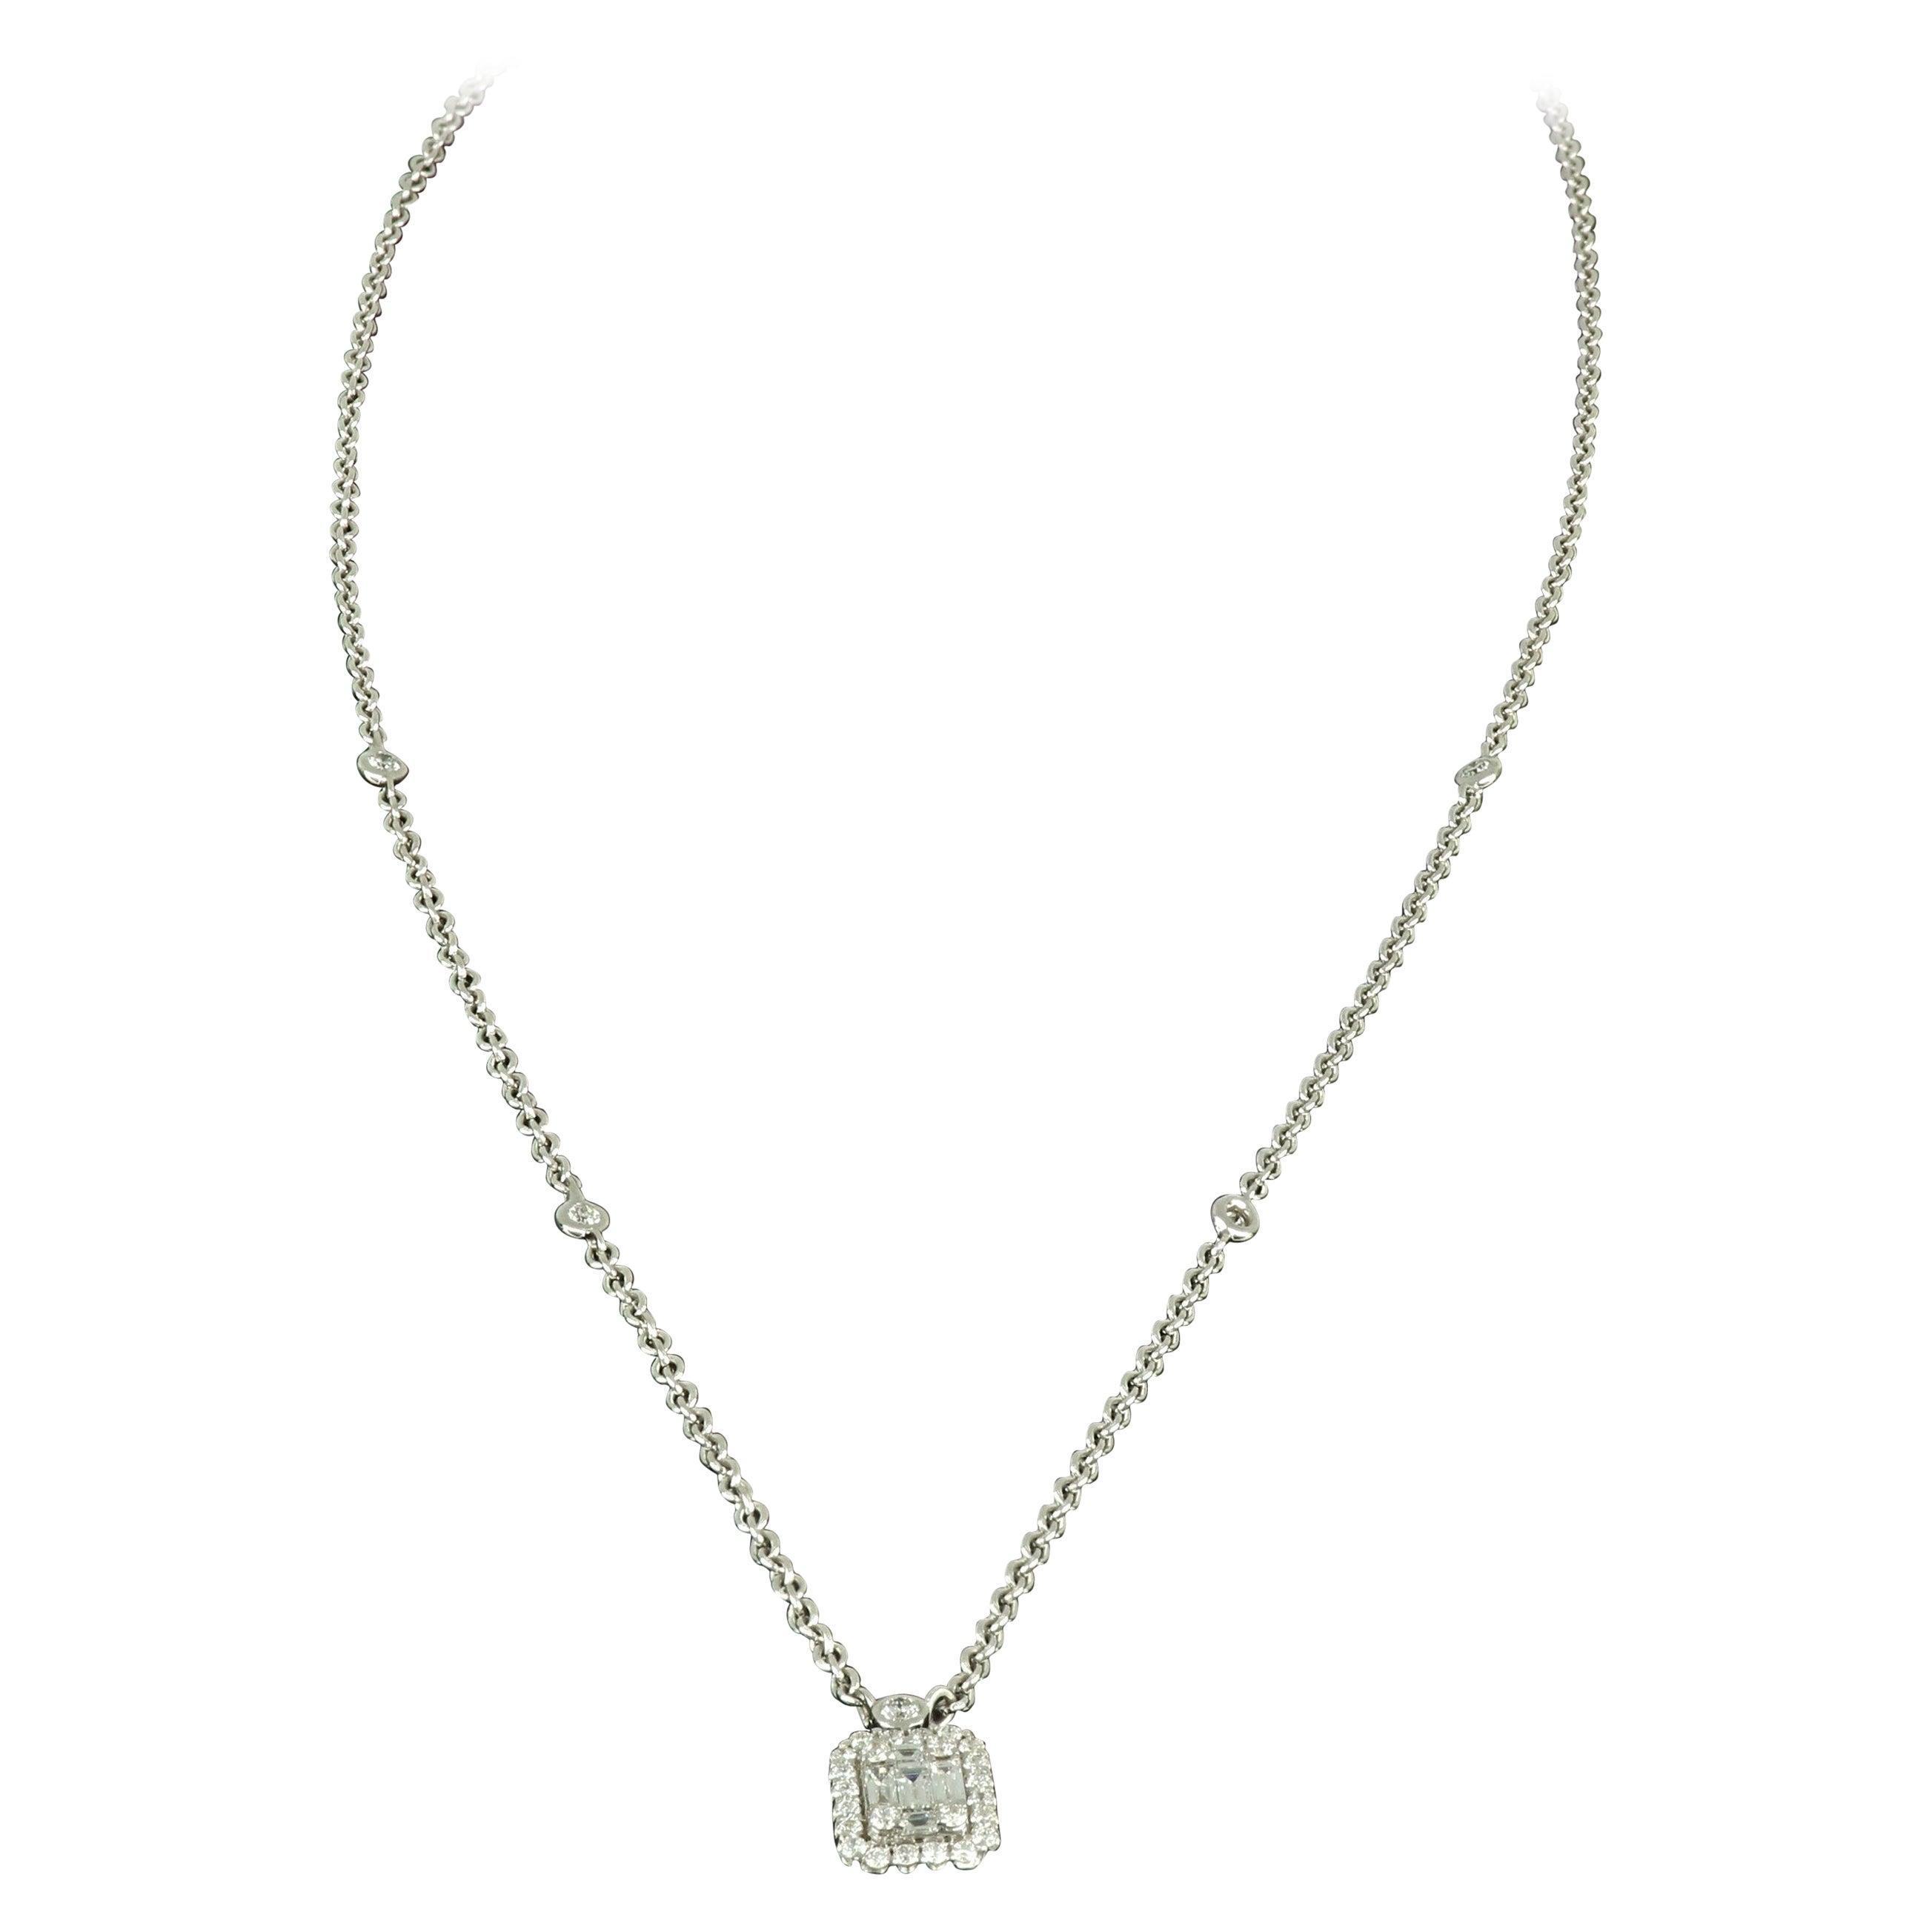 Amwaj Jewellery 18 Karat White Gold Pendant with Emerald Diamond